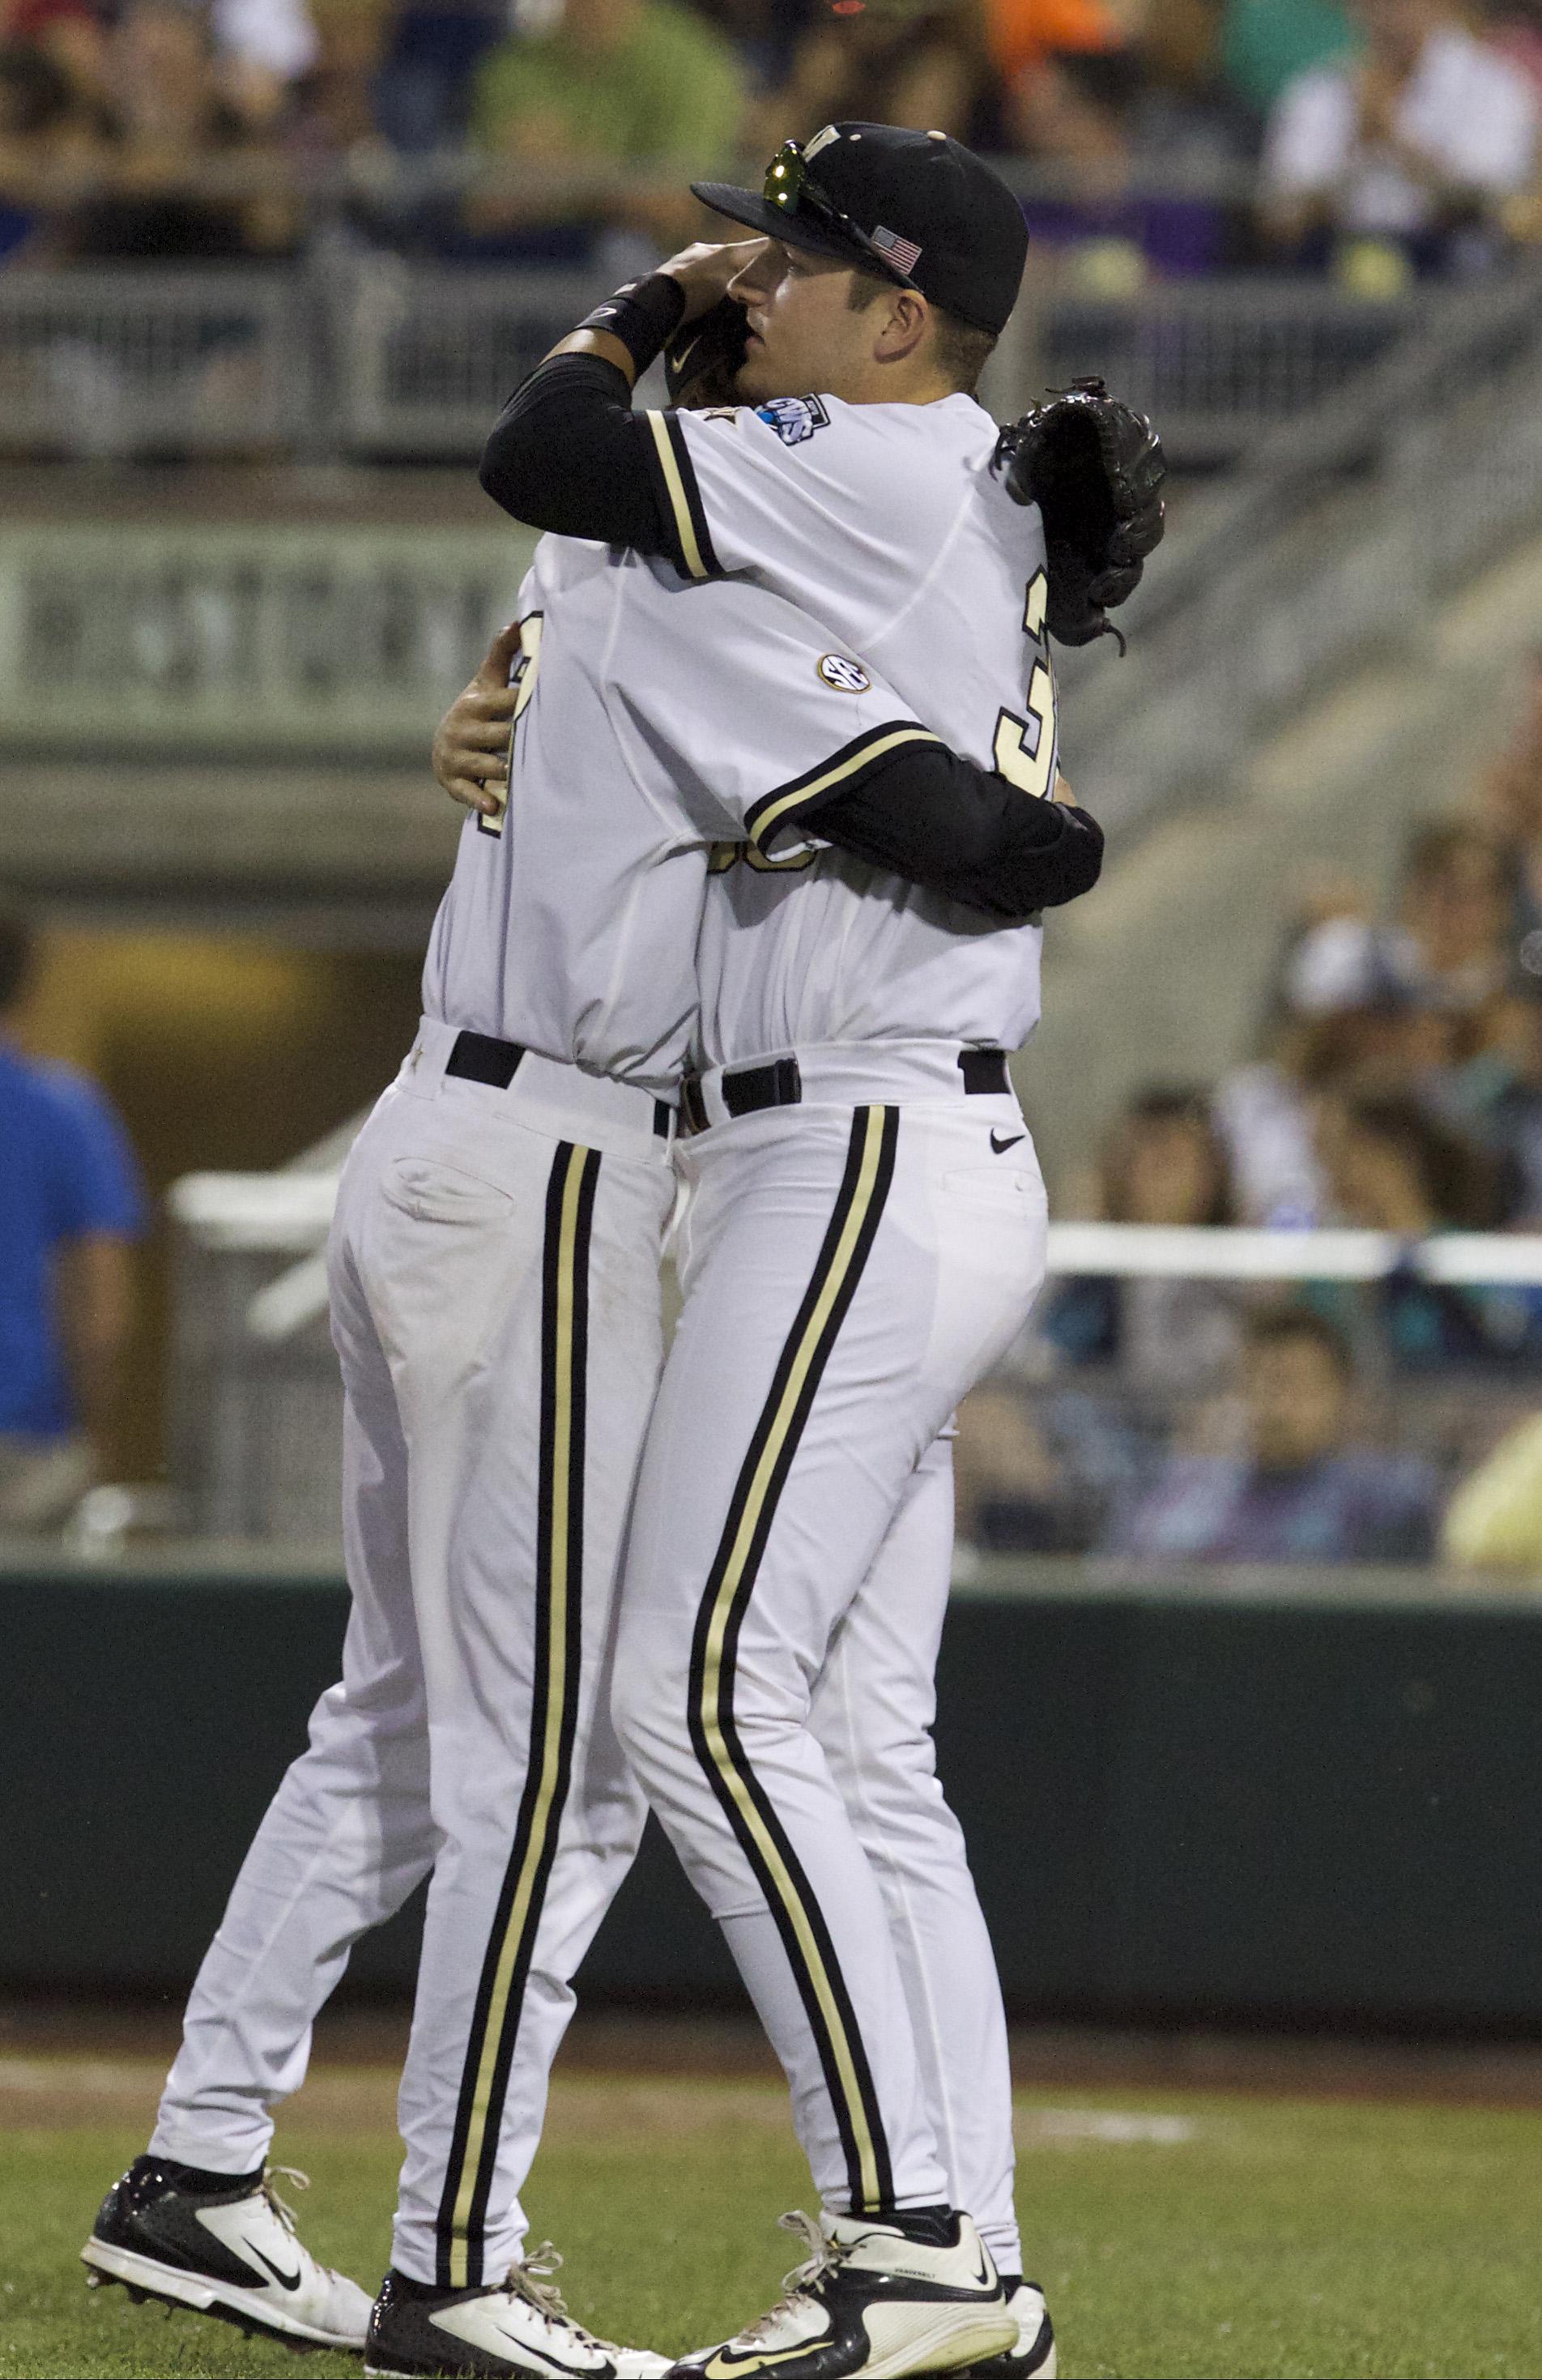 Man hugs all around!